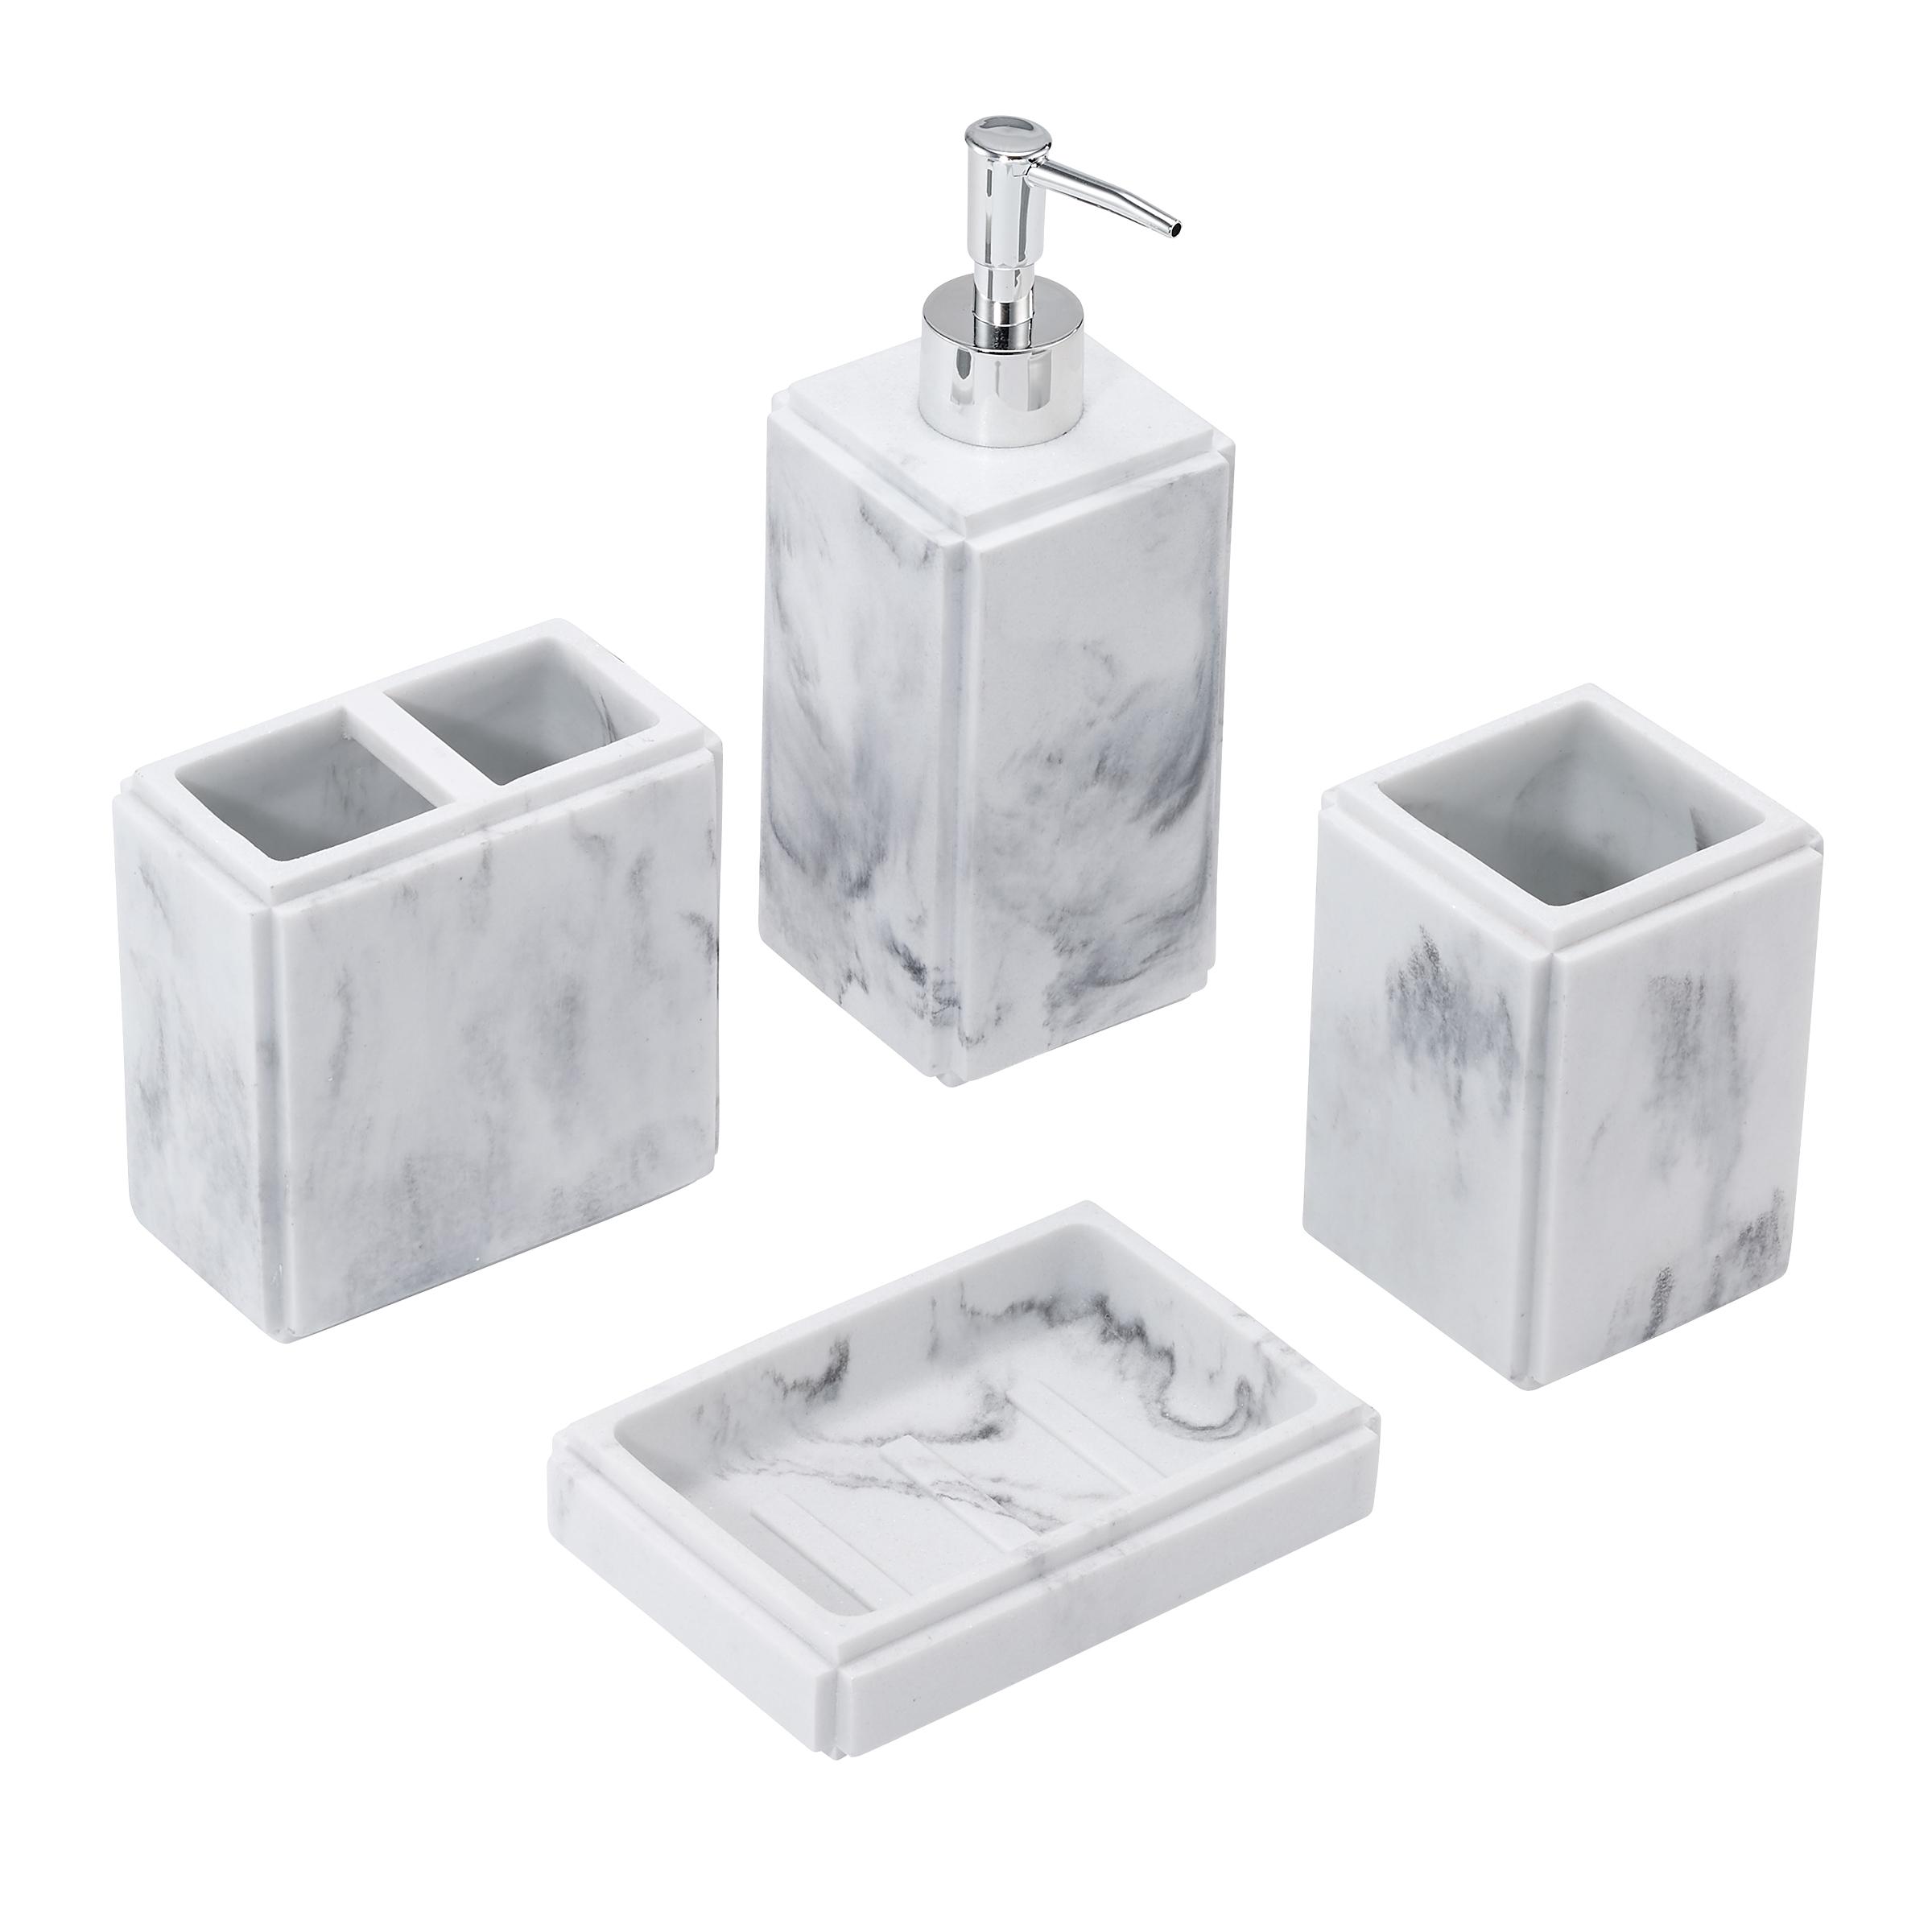 Avanti Linens, Avanti Bathroom Sets